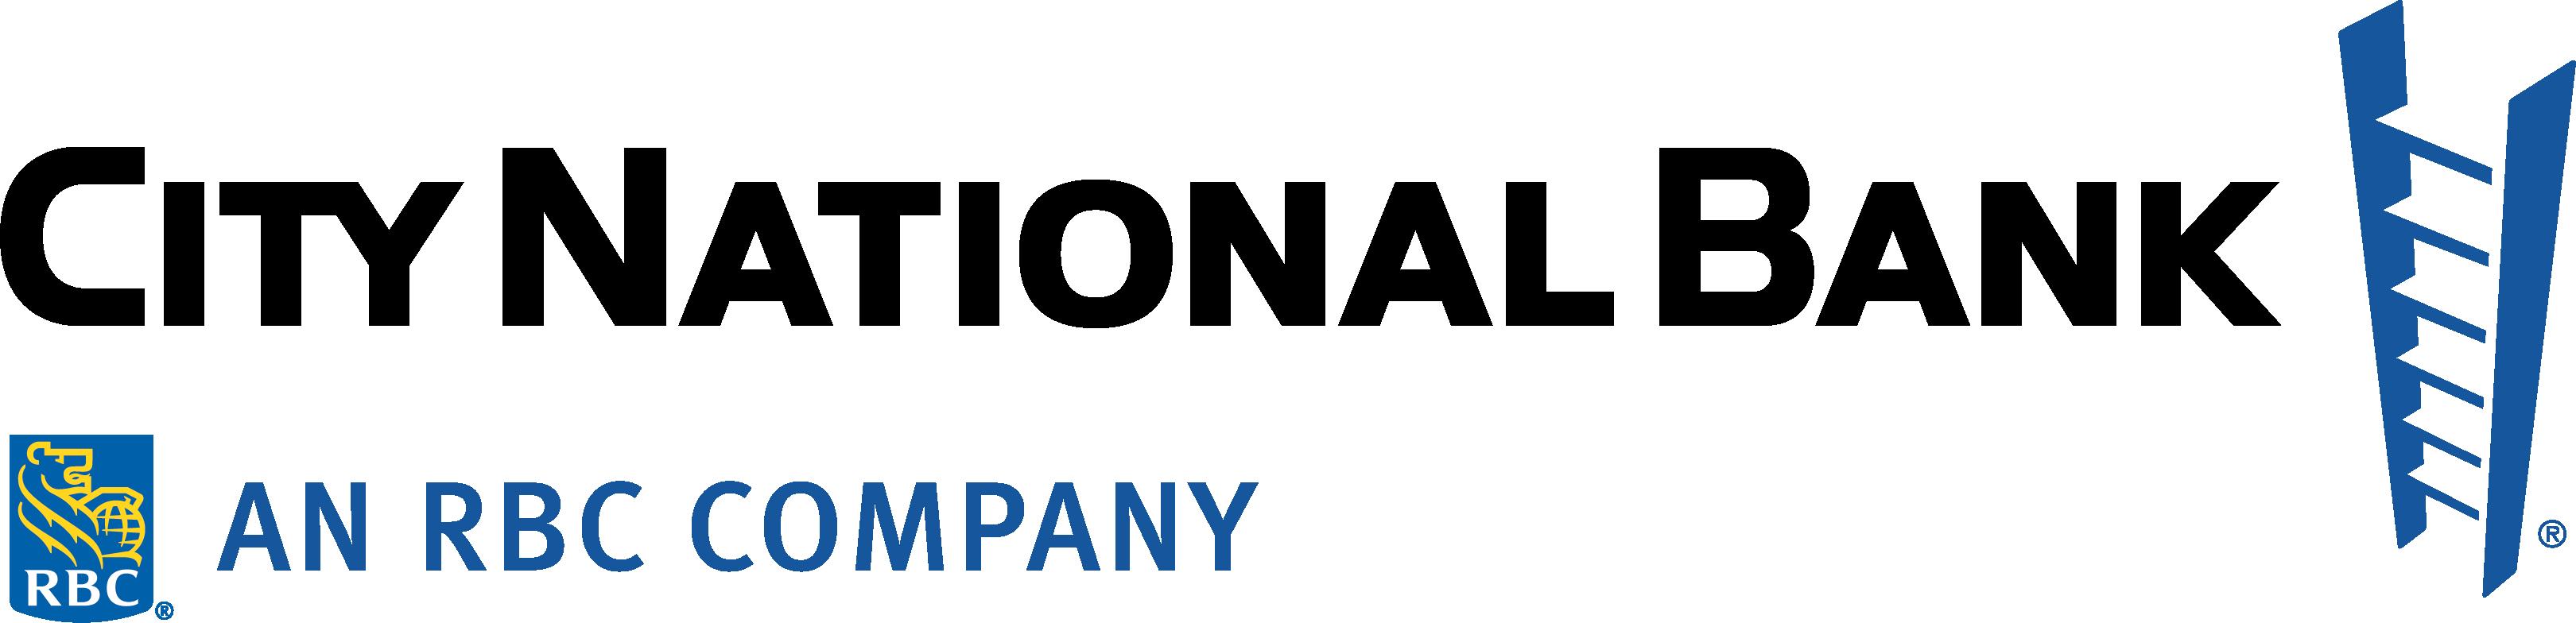 CNB-RBC Integrated Logo_RGB